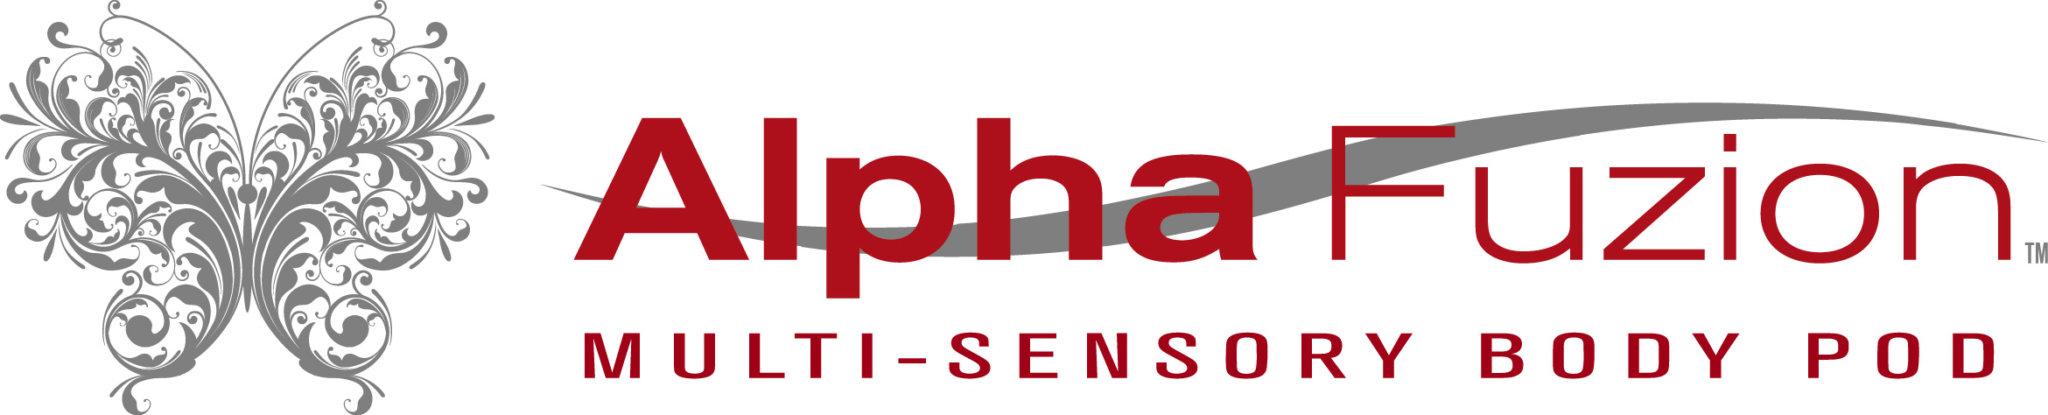 Alpha-Fuzion-Hortizontal-Logo-2048x415